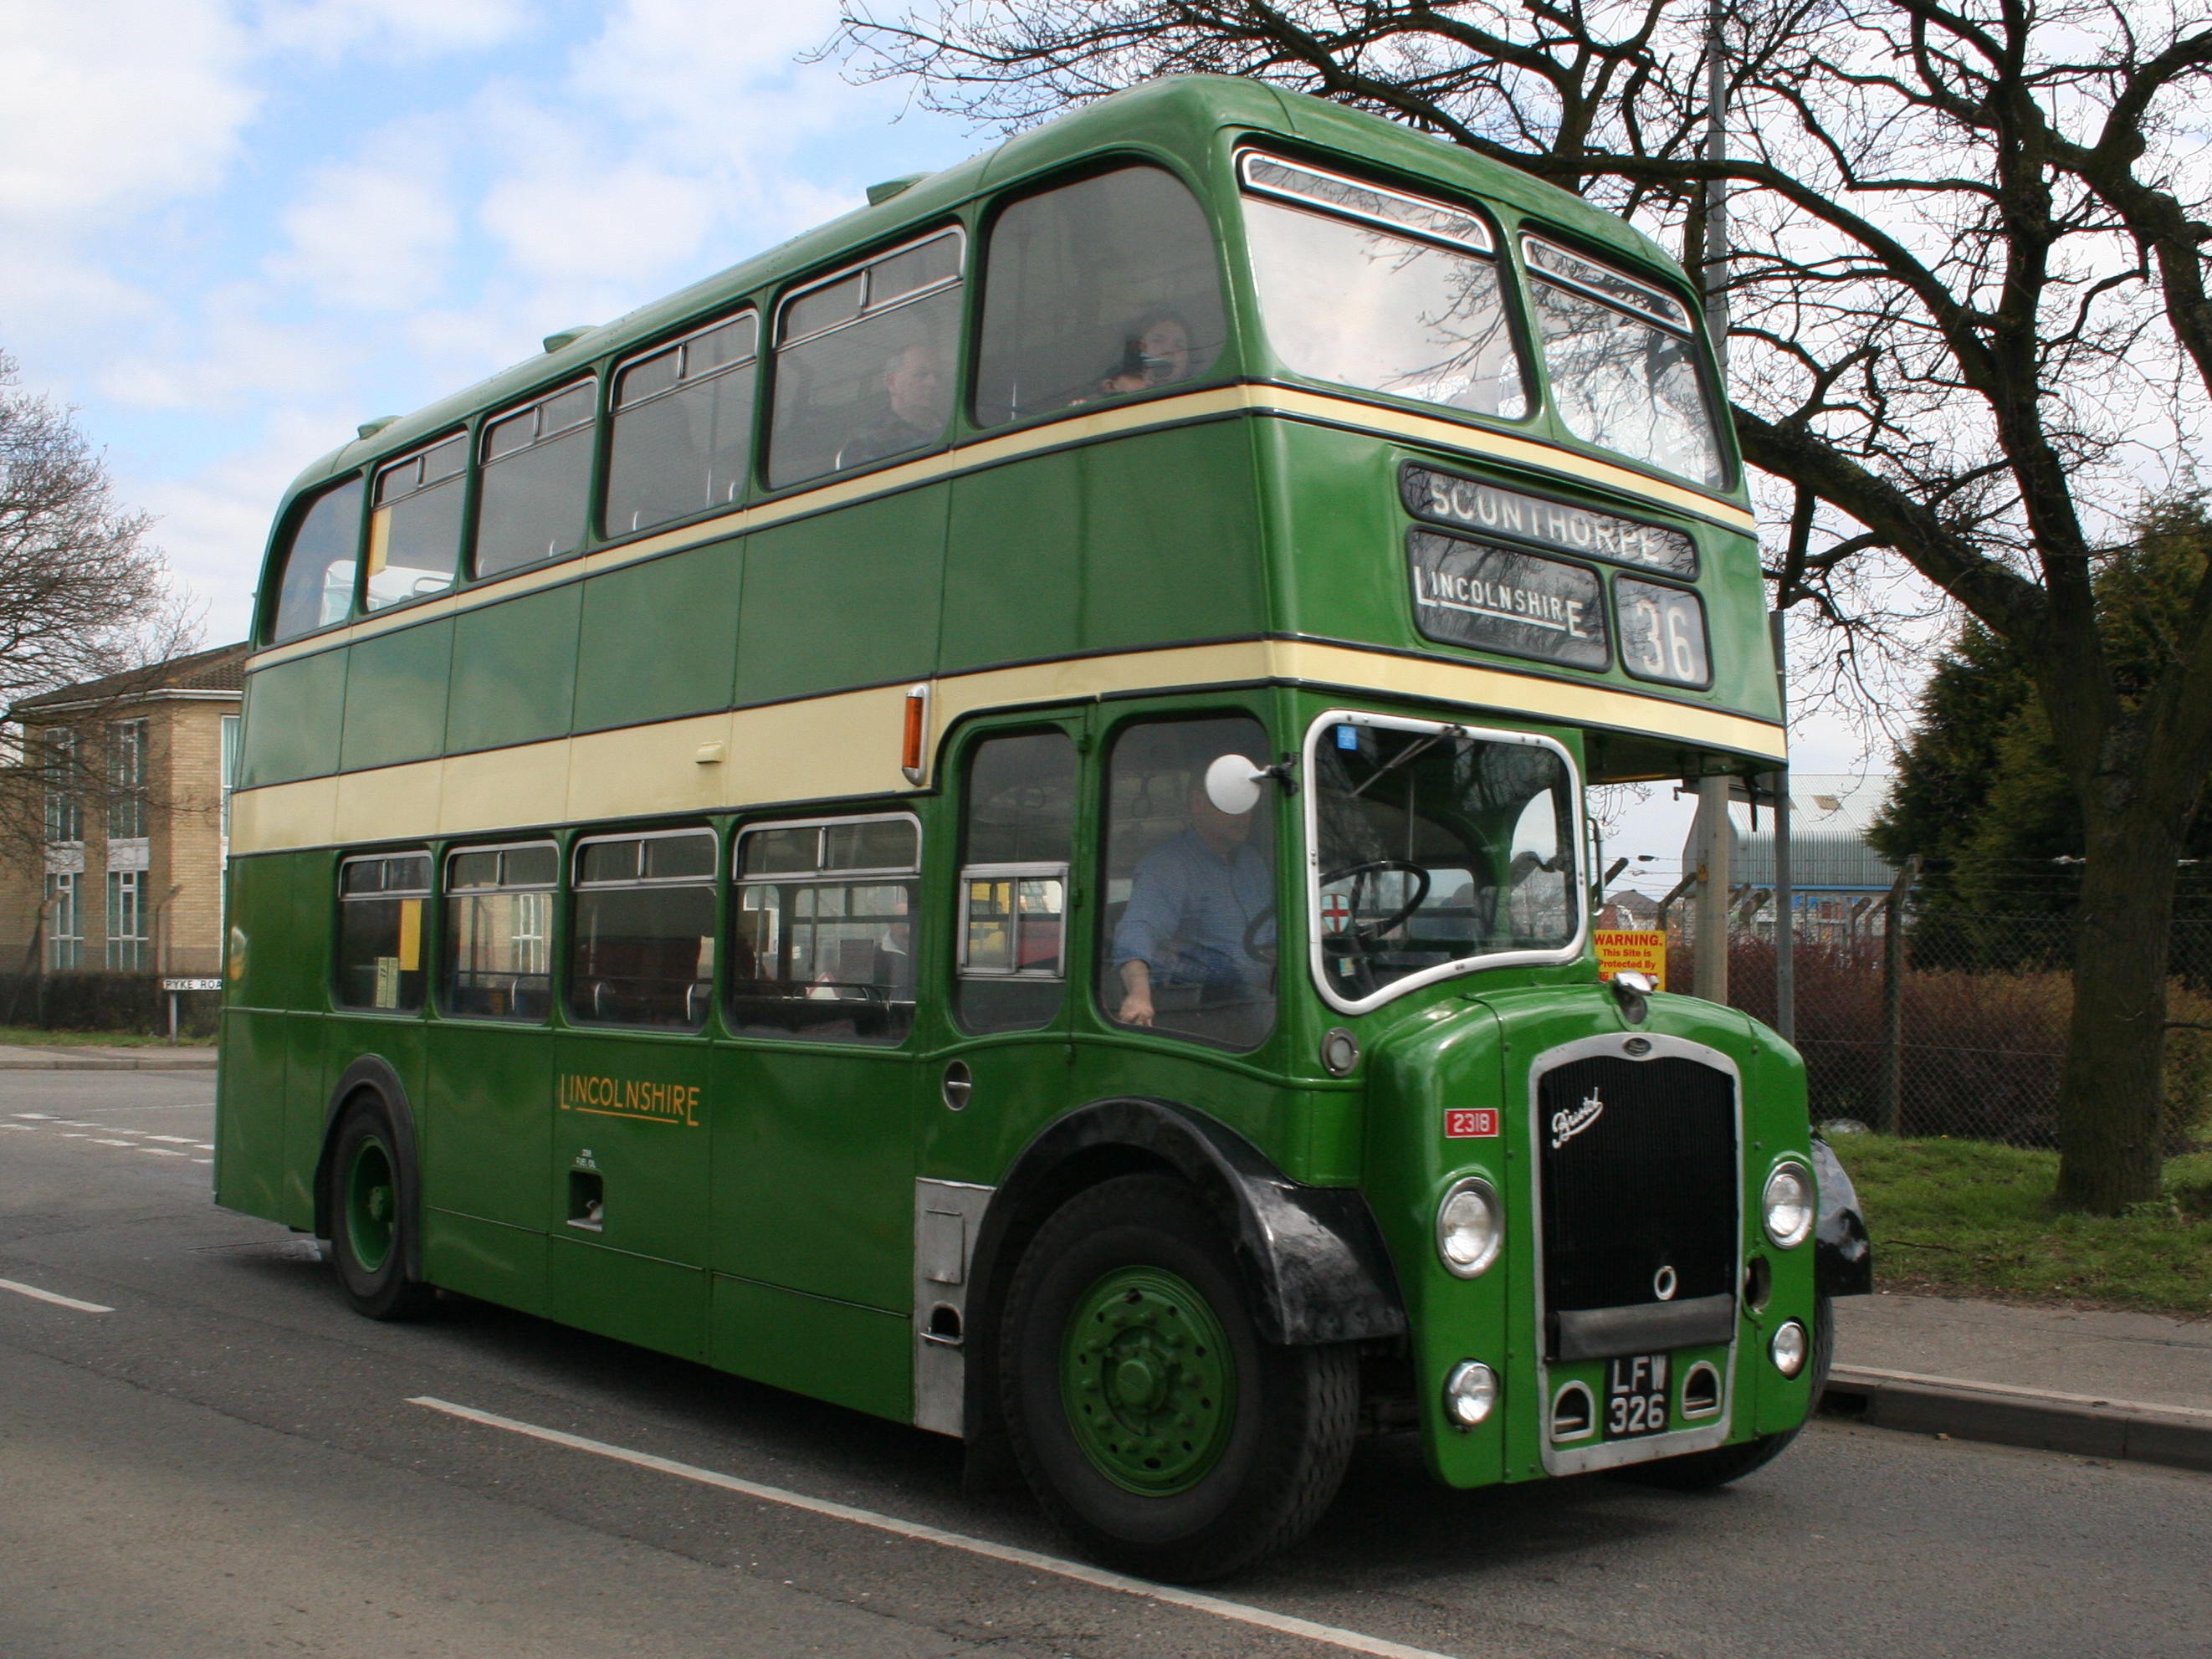 File:Lincolnshire Road Car bus 2318 (LFW 326), 2006 ...